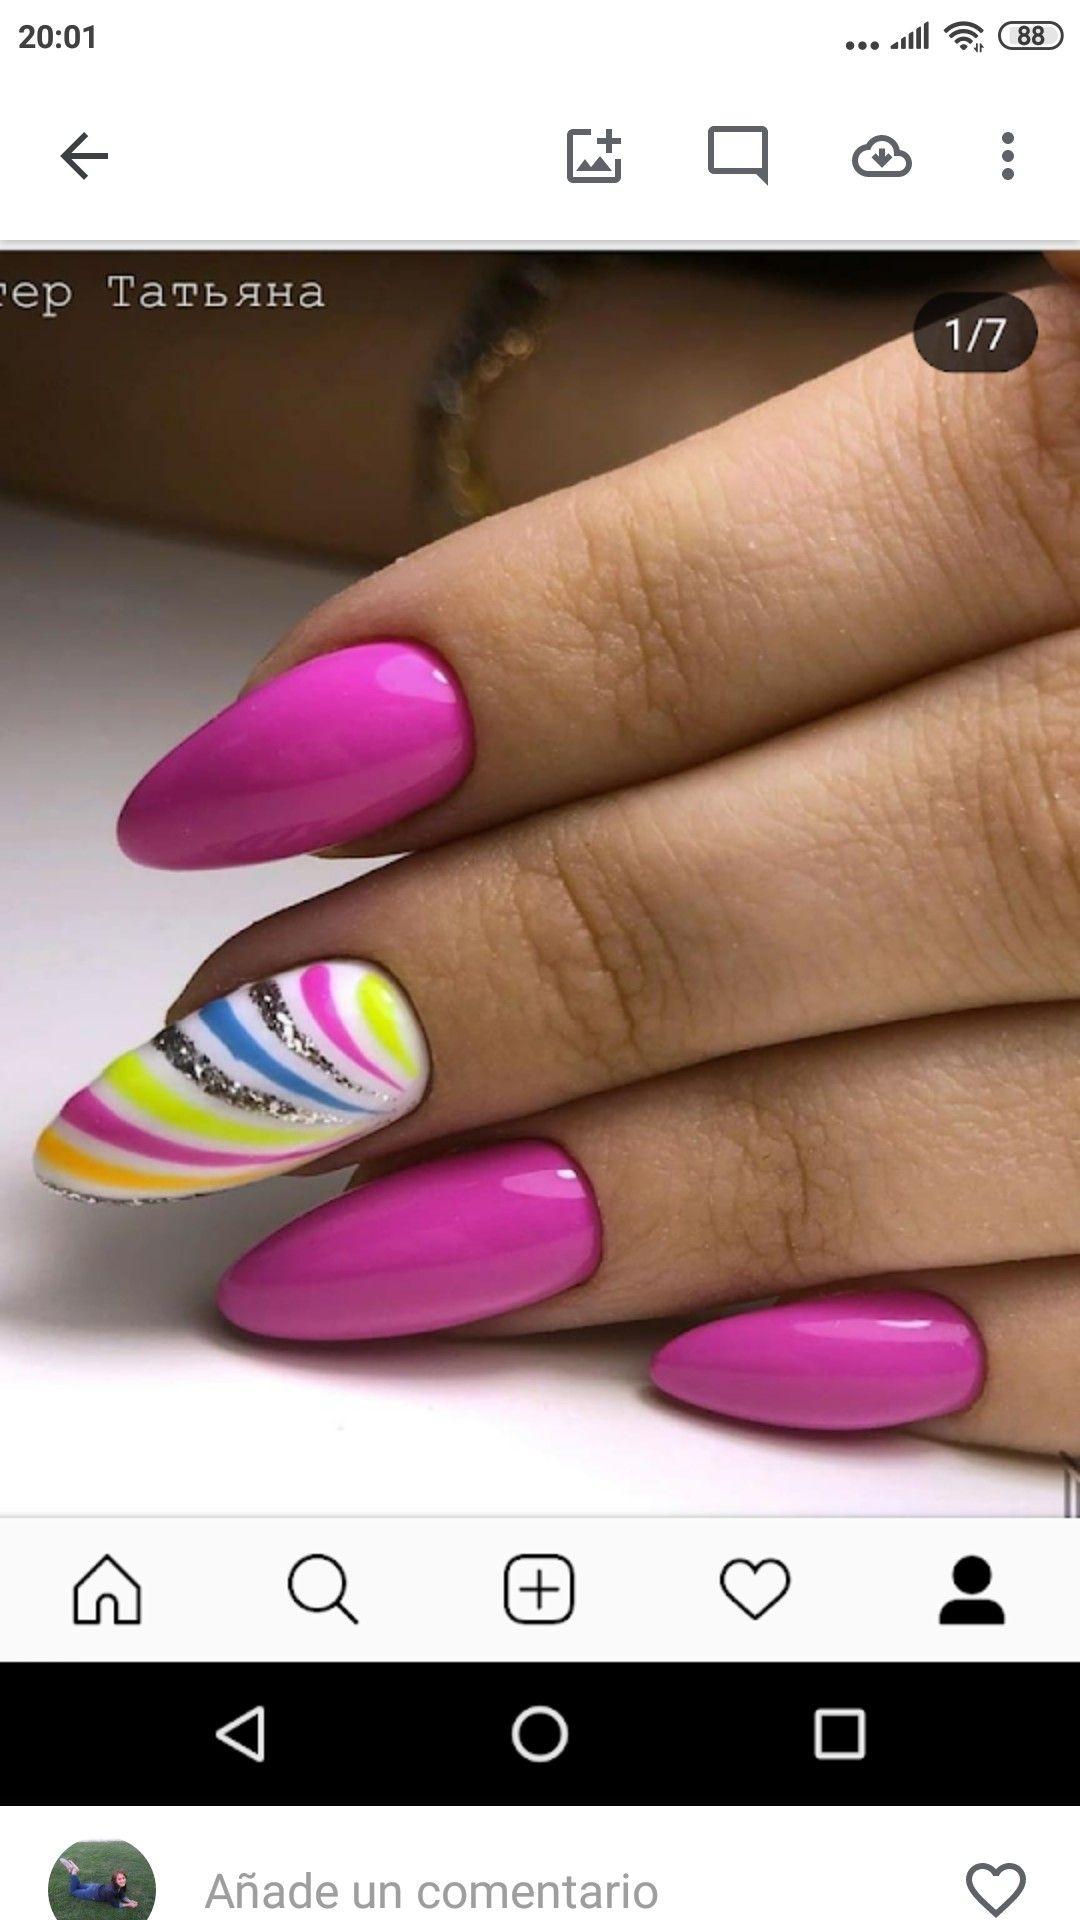 Pin By Alena Hanzlikova On Primavera Verano Pink Nails Pretty Nails Acrilic Nails